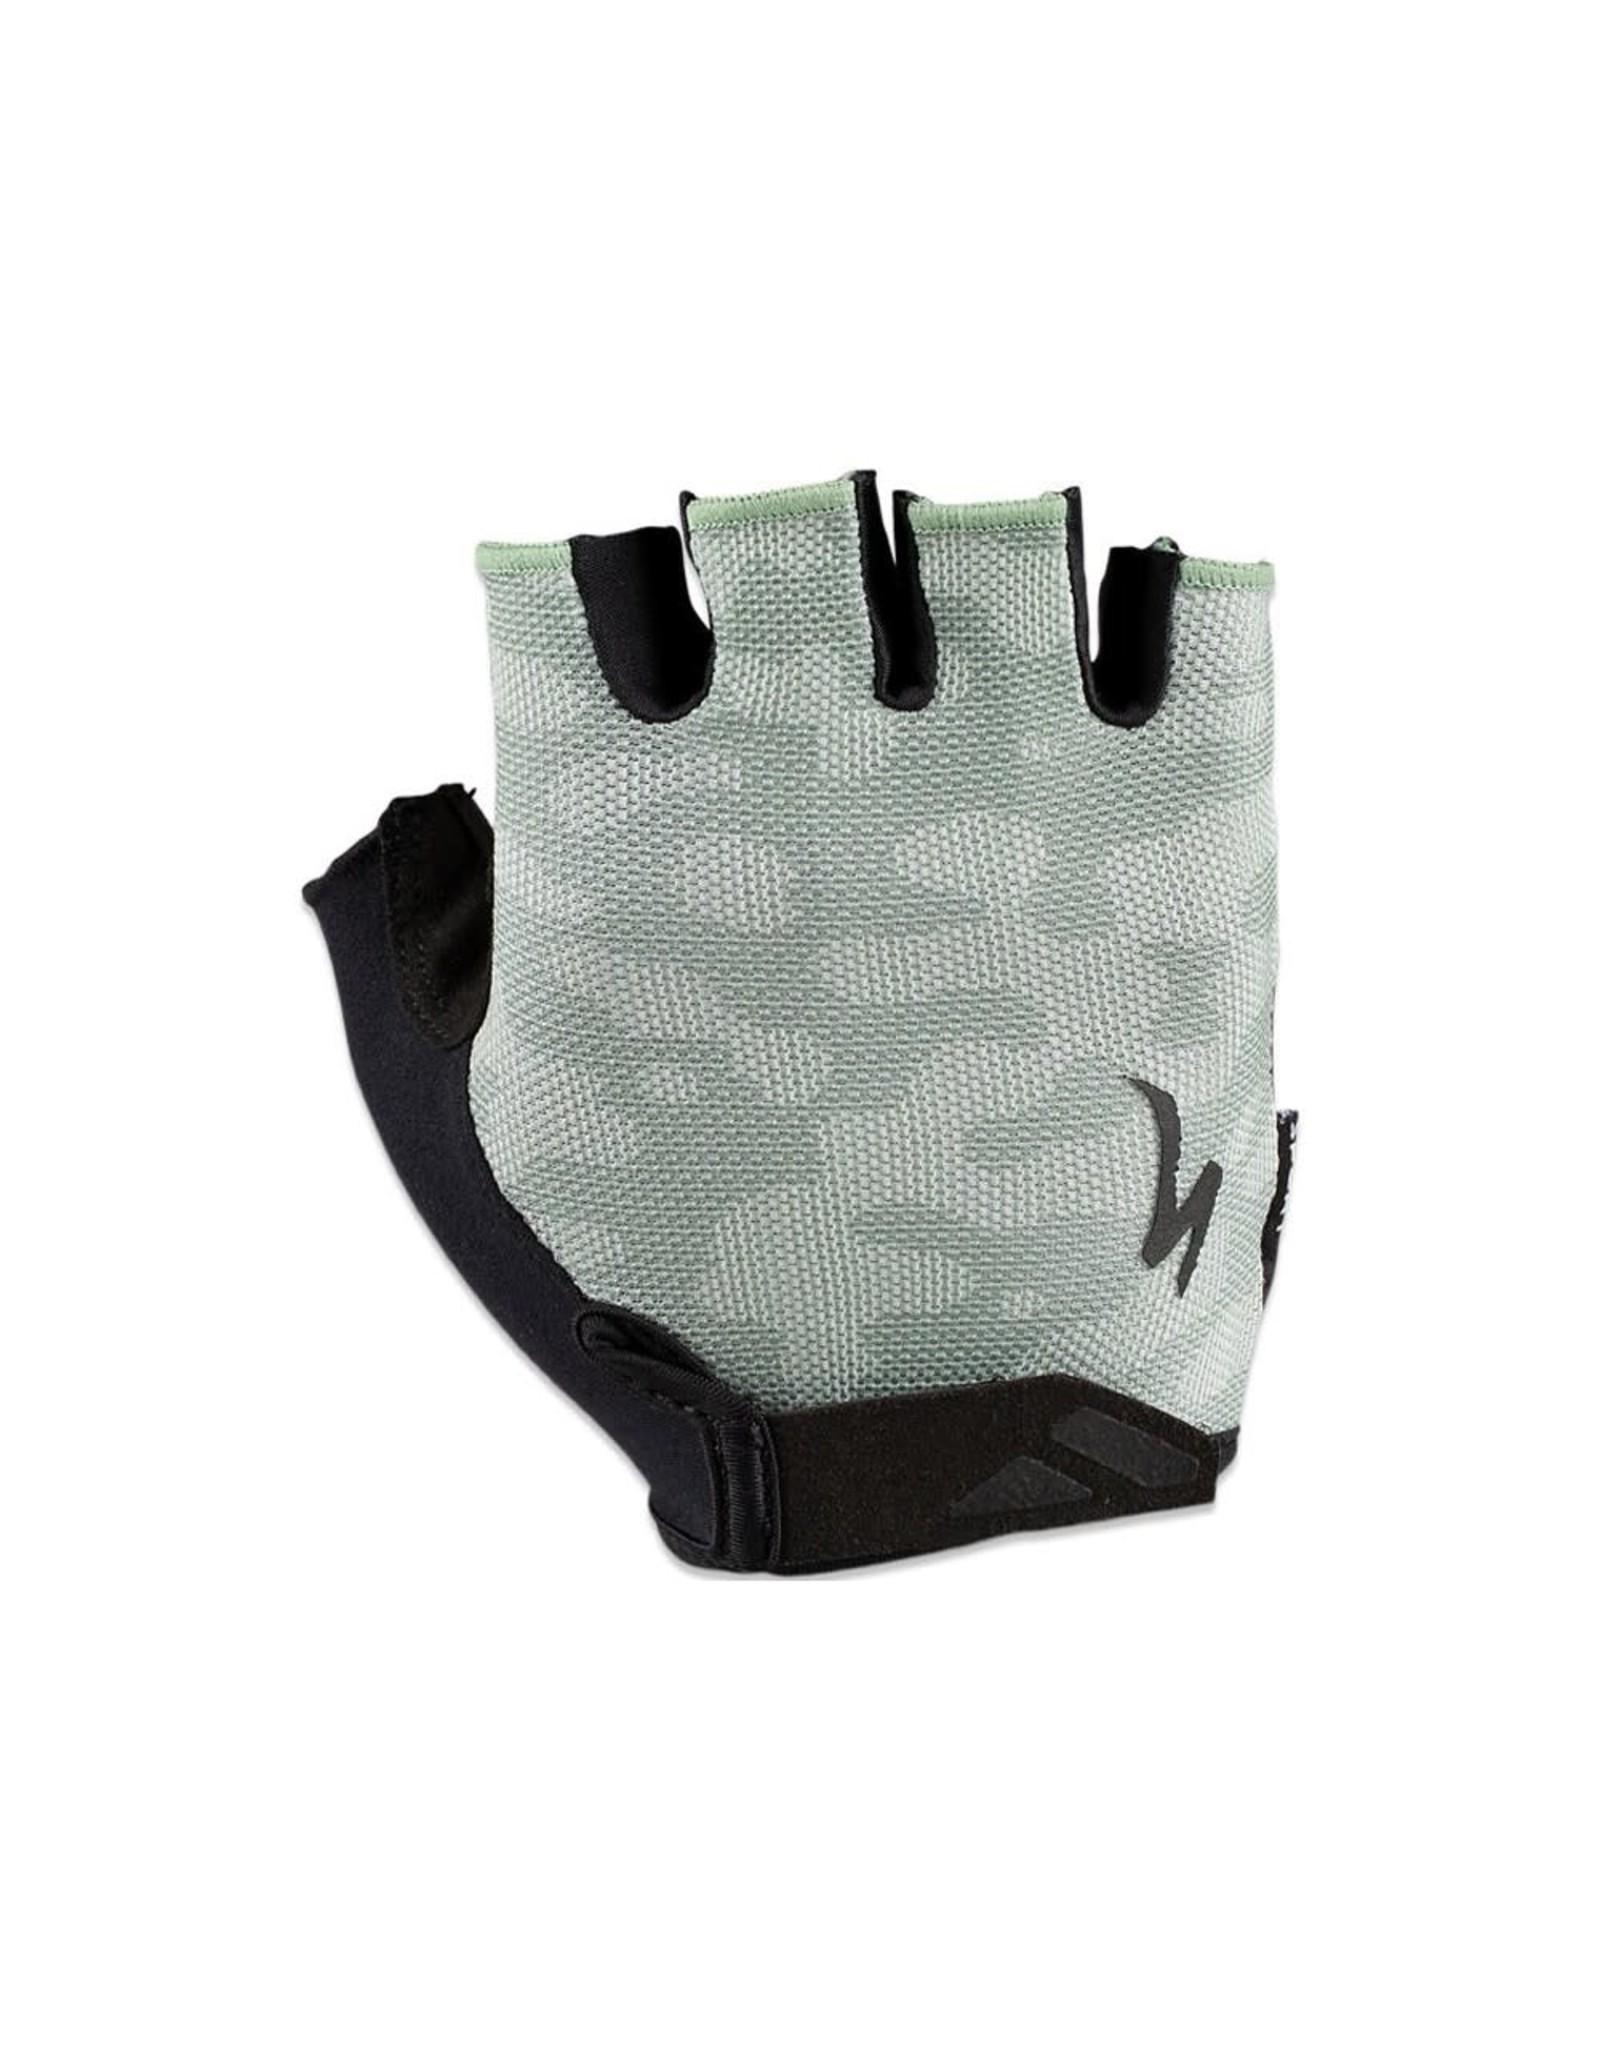 Specialized Glove Spec Sport SgeGrn/Spr Medium